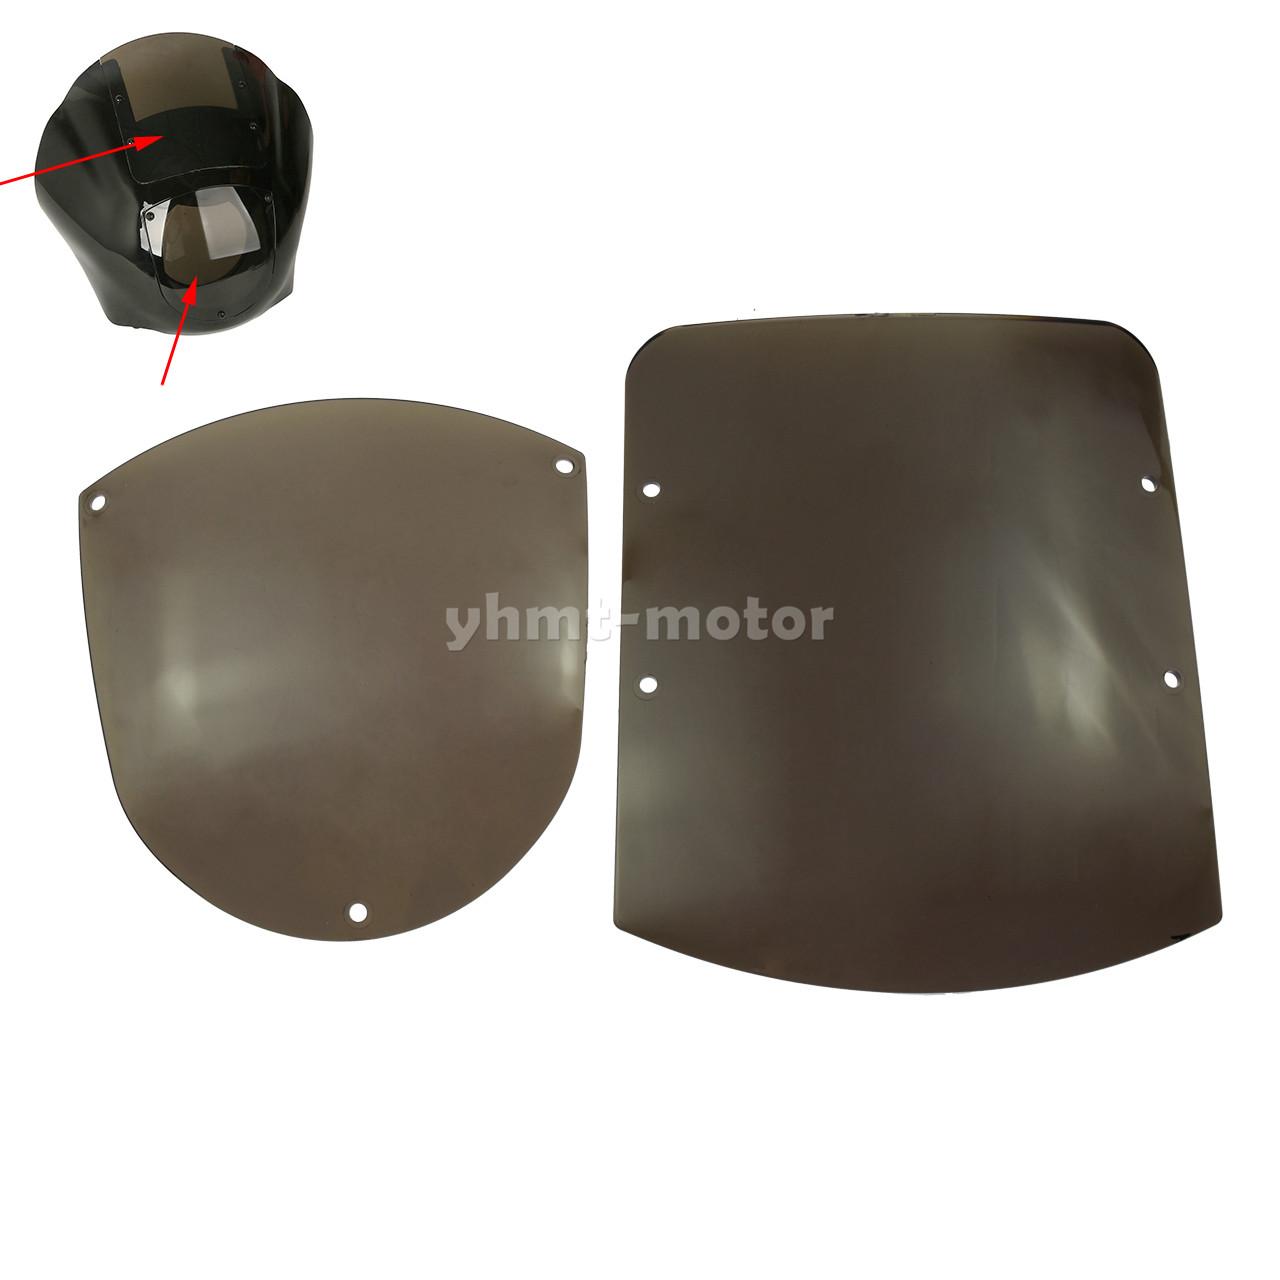 Quarter Fairing Windshield Kit Fit For Sportster XL 1200 88-up Dyna 1995-05 FXR